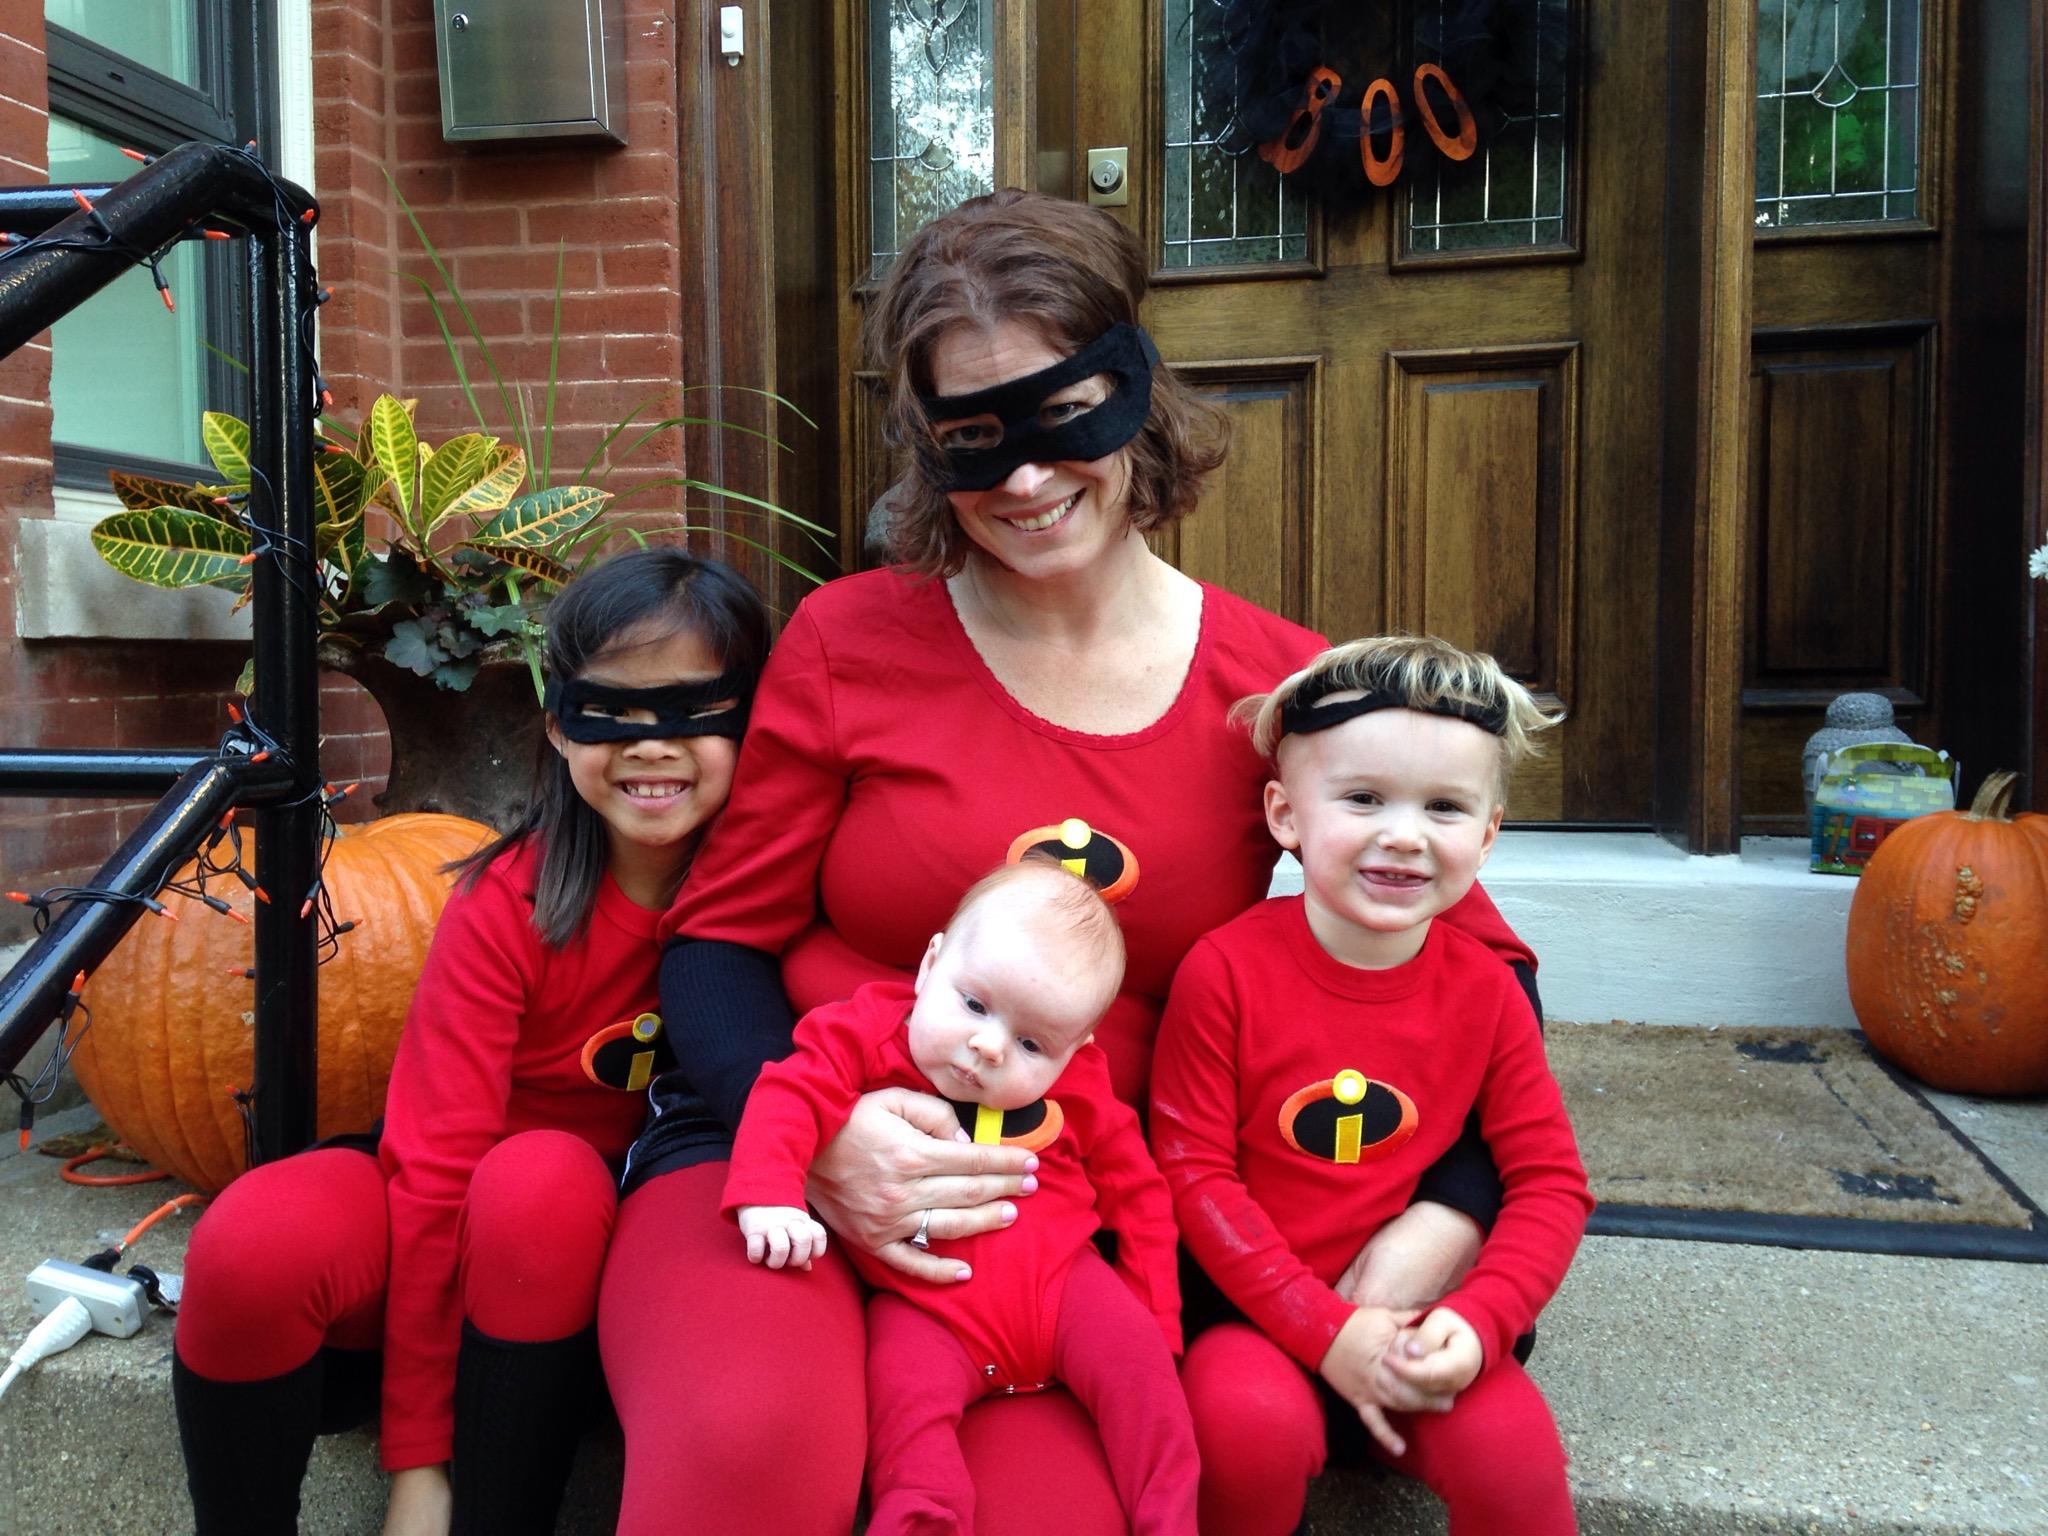 Happy Halloween 2014 – The Incredibles